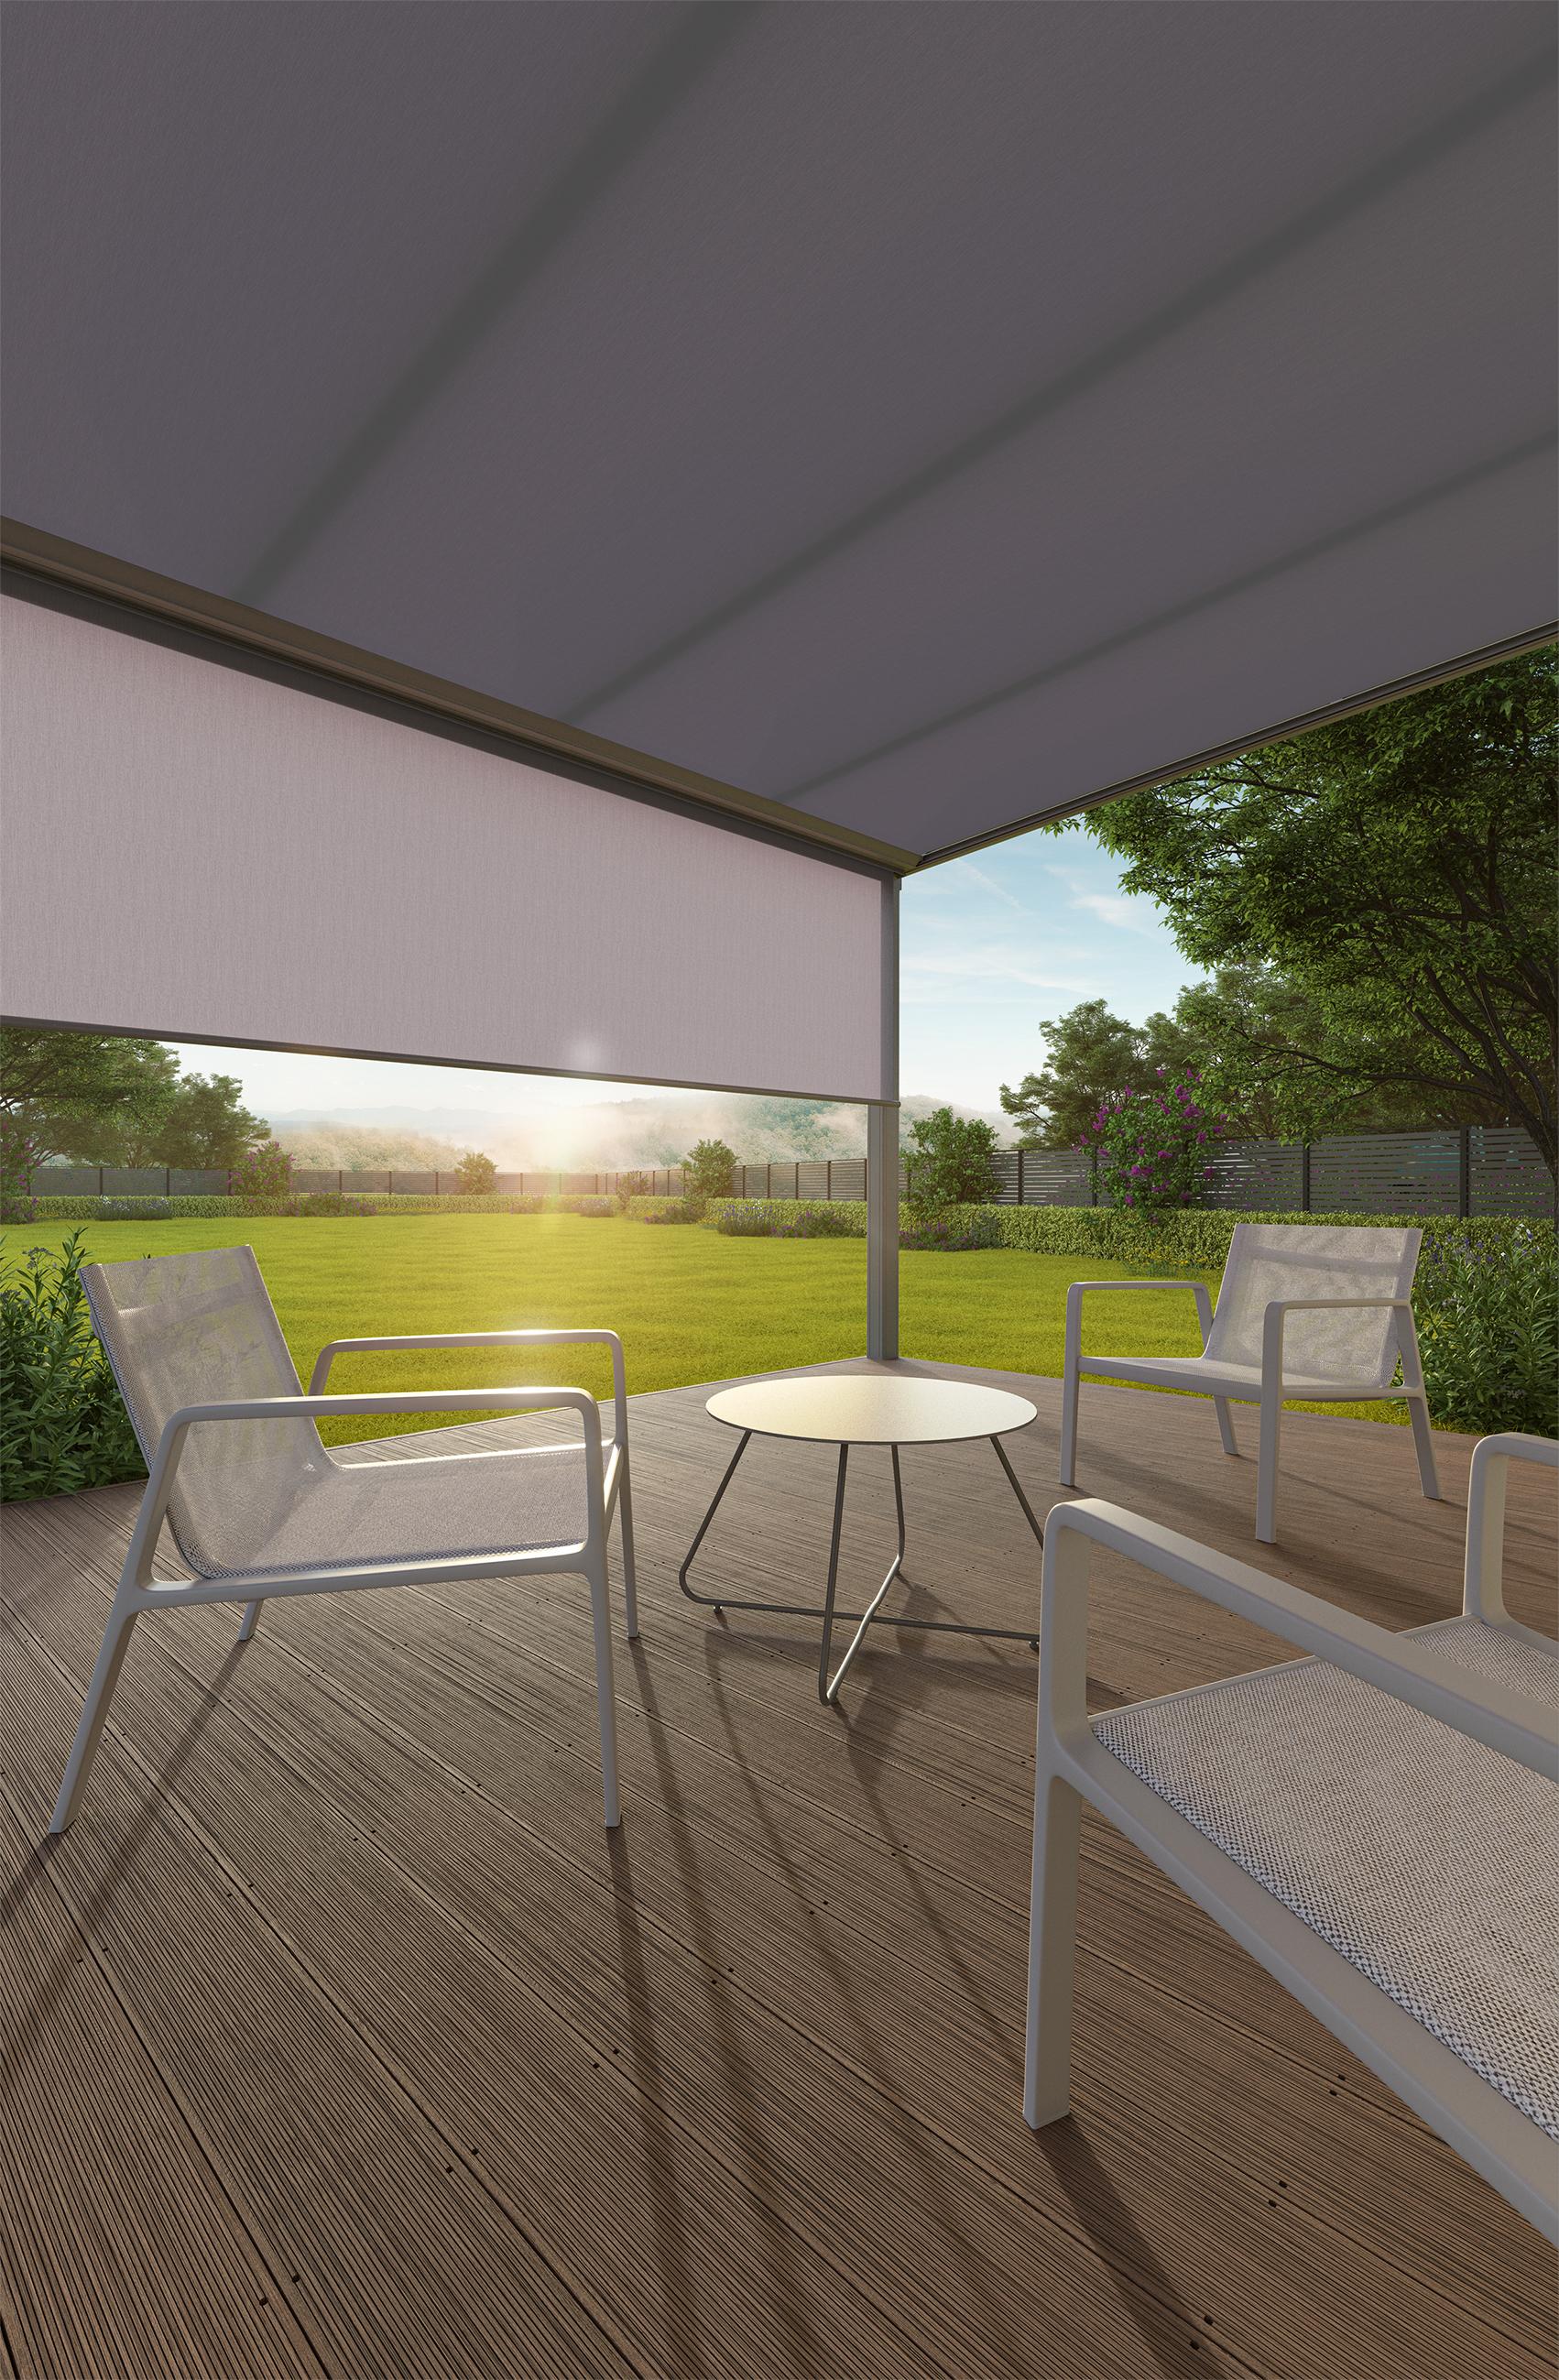 LEW_ancona_u_vv_innen_terrasse_xl.jpg